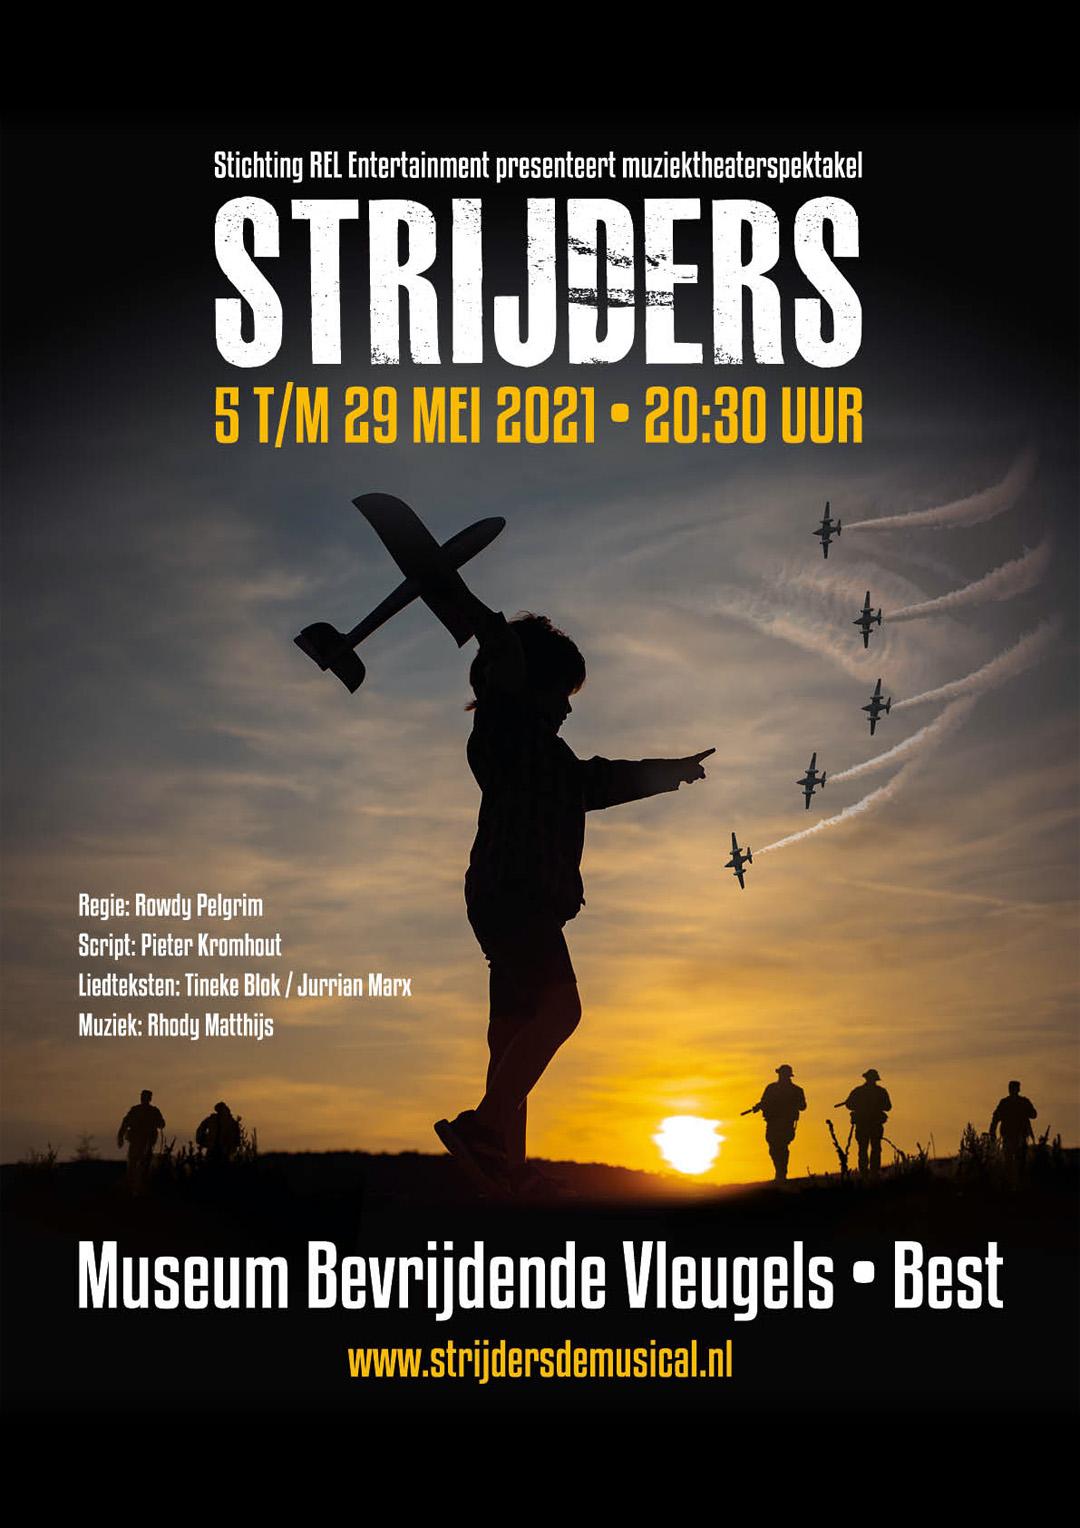 Strijders artwork